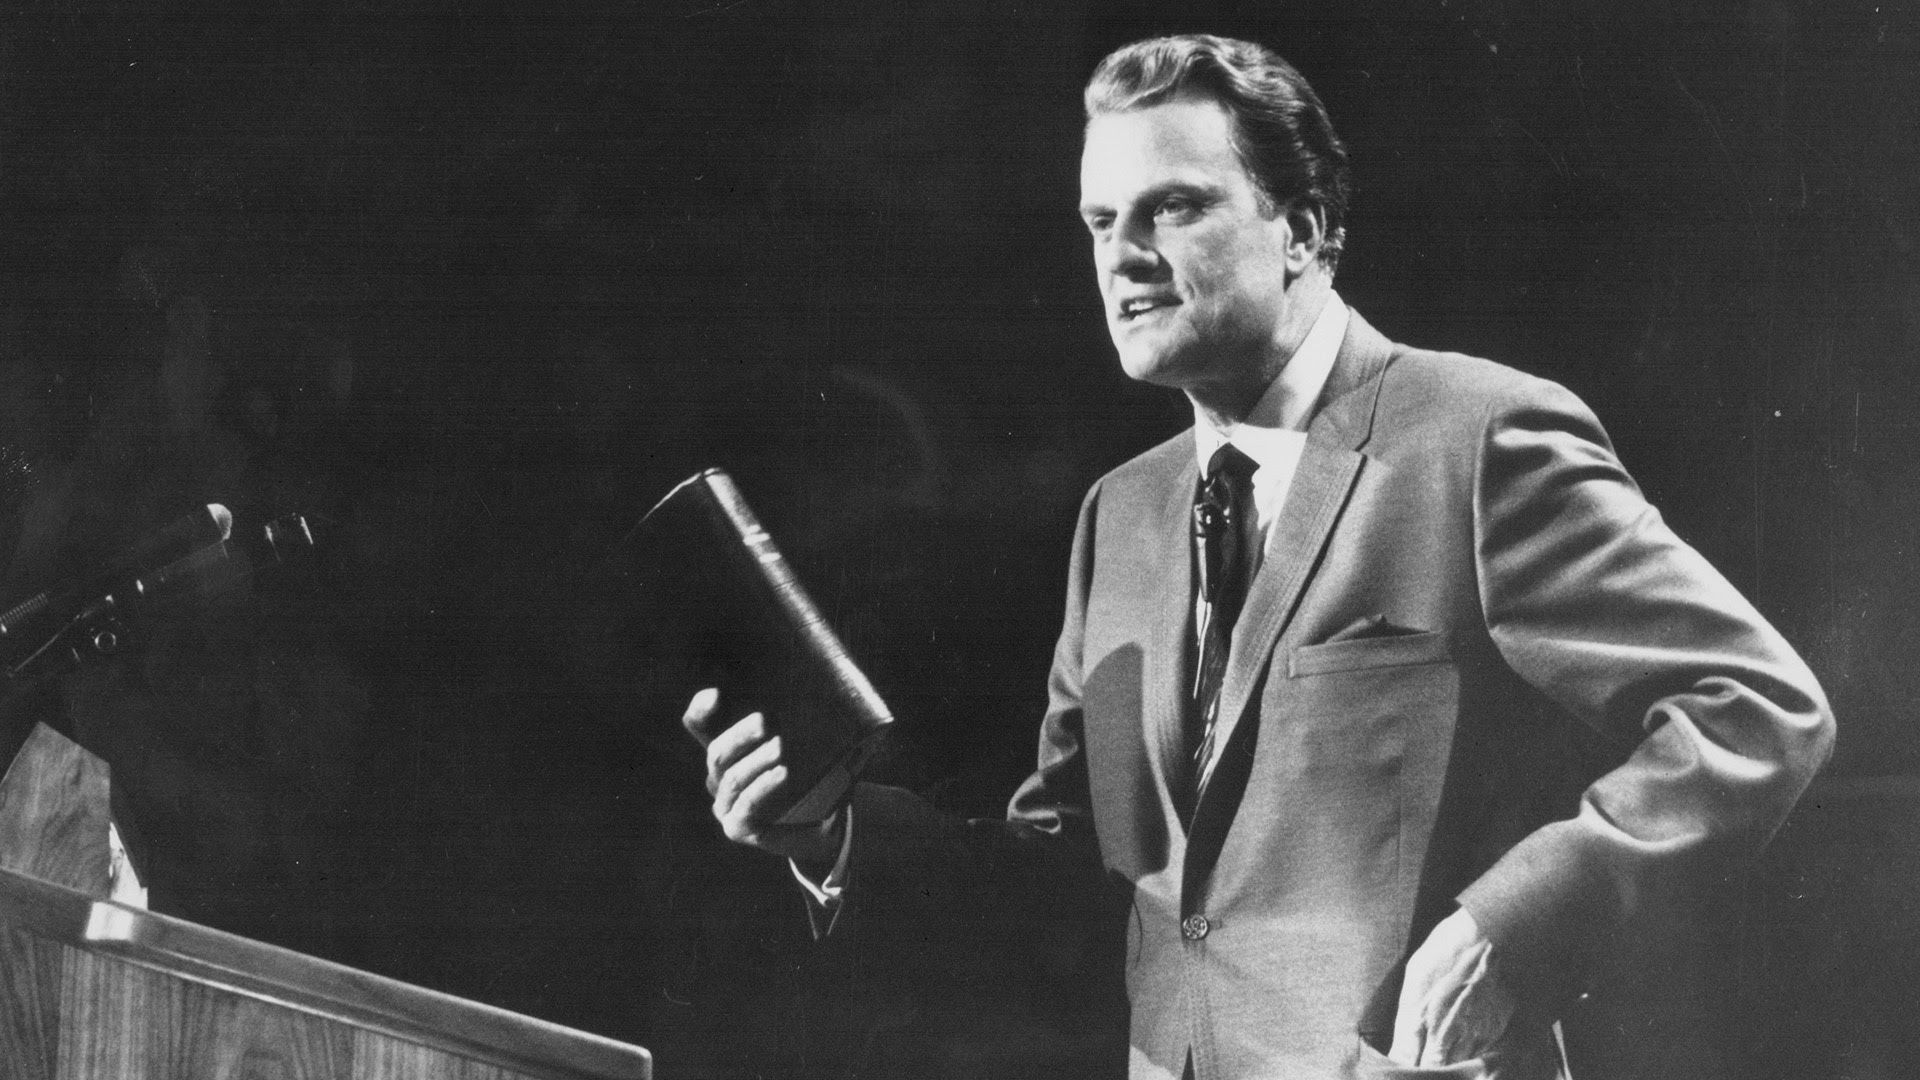 ktvb.com | Evangelist Rev. Billy Graham dies at age 99